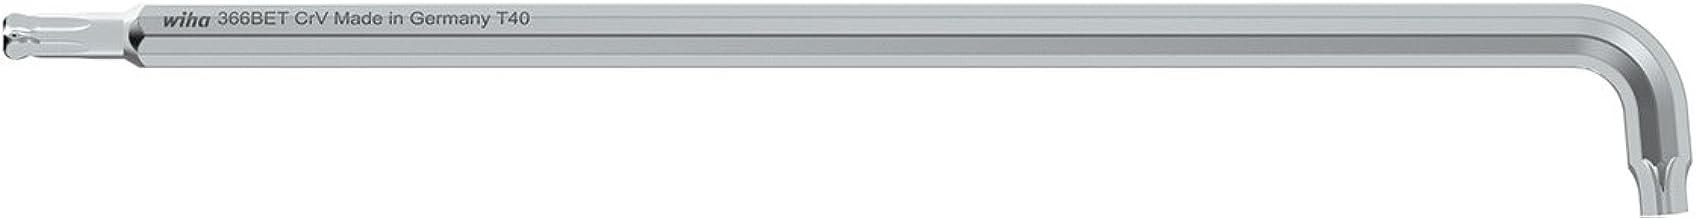 Wiha Wechselklinge TORX/® f/ür Drehmoment-Schraubendreher mit L/ängsgriff T5 x 175 mm 26158 0,4 Nm